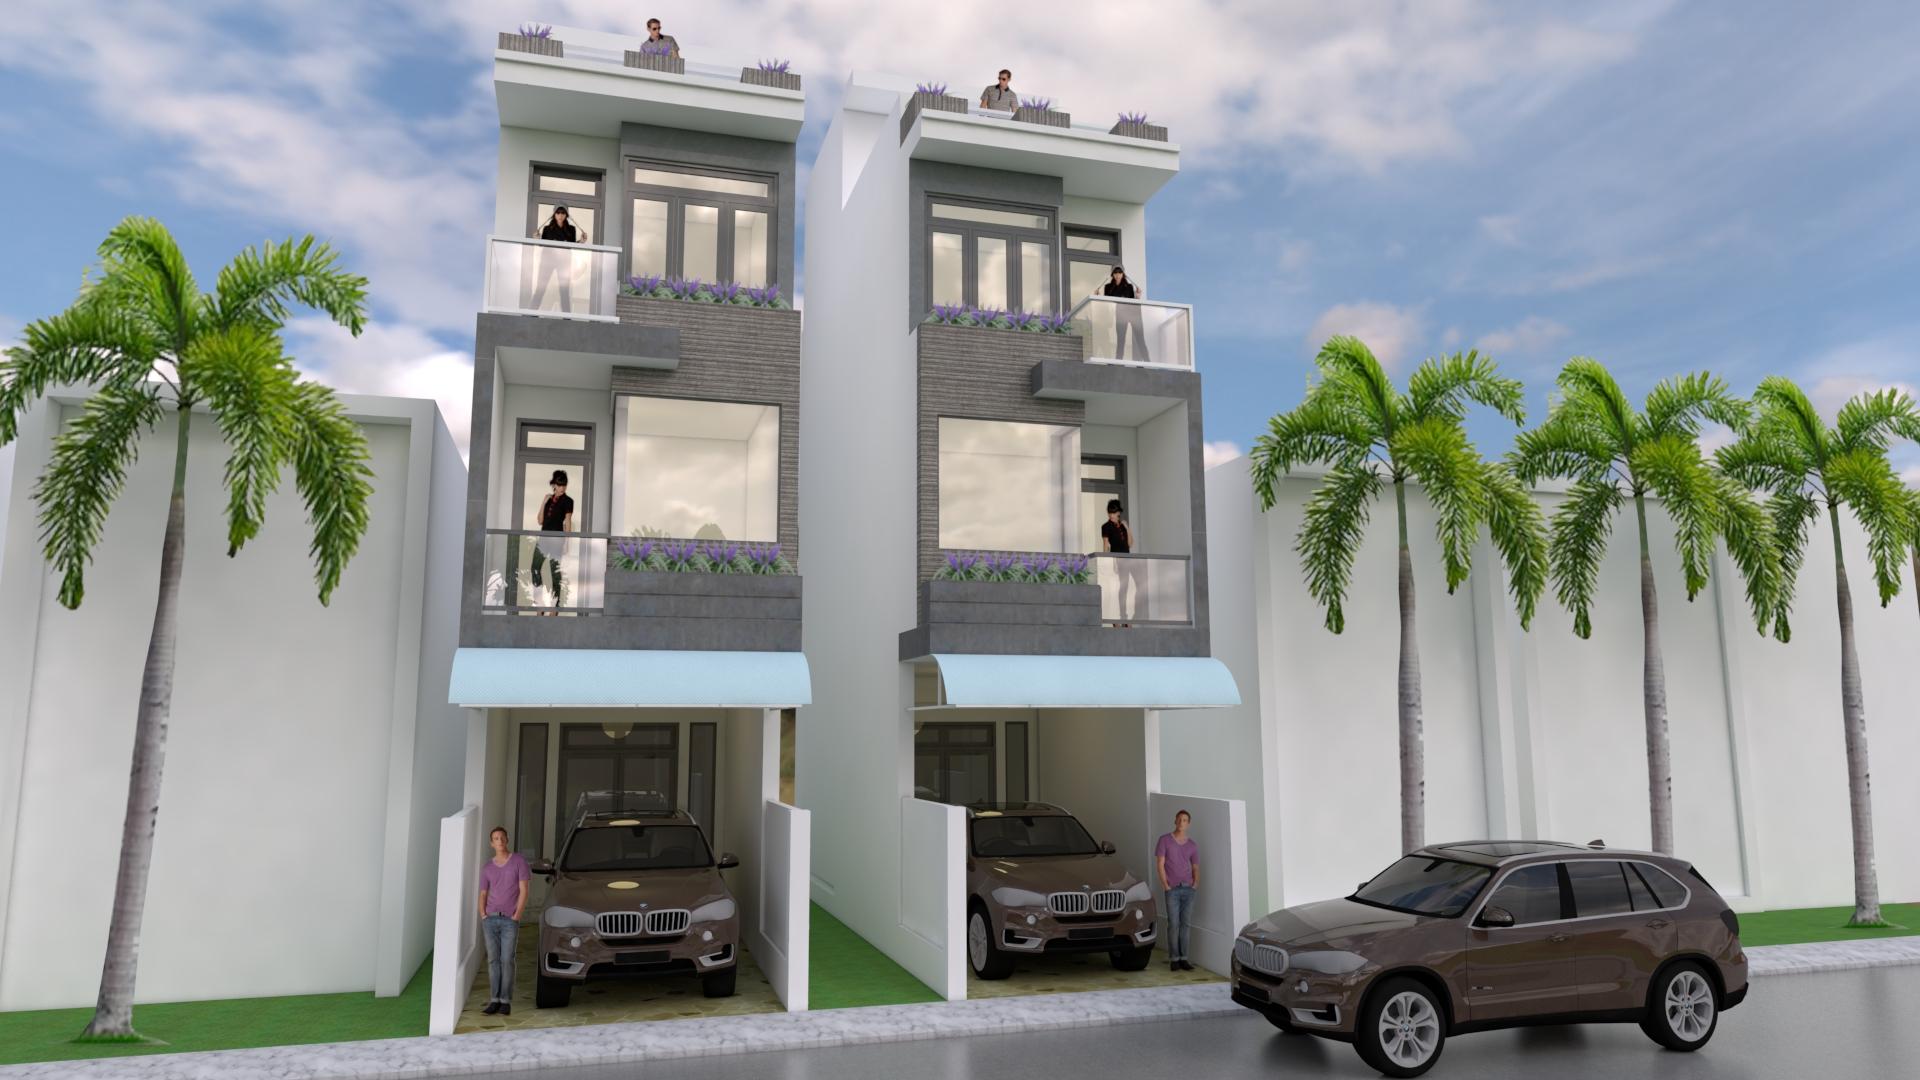 Sketchup Modern Narrow House Design 3.5 x 18 meter ...